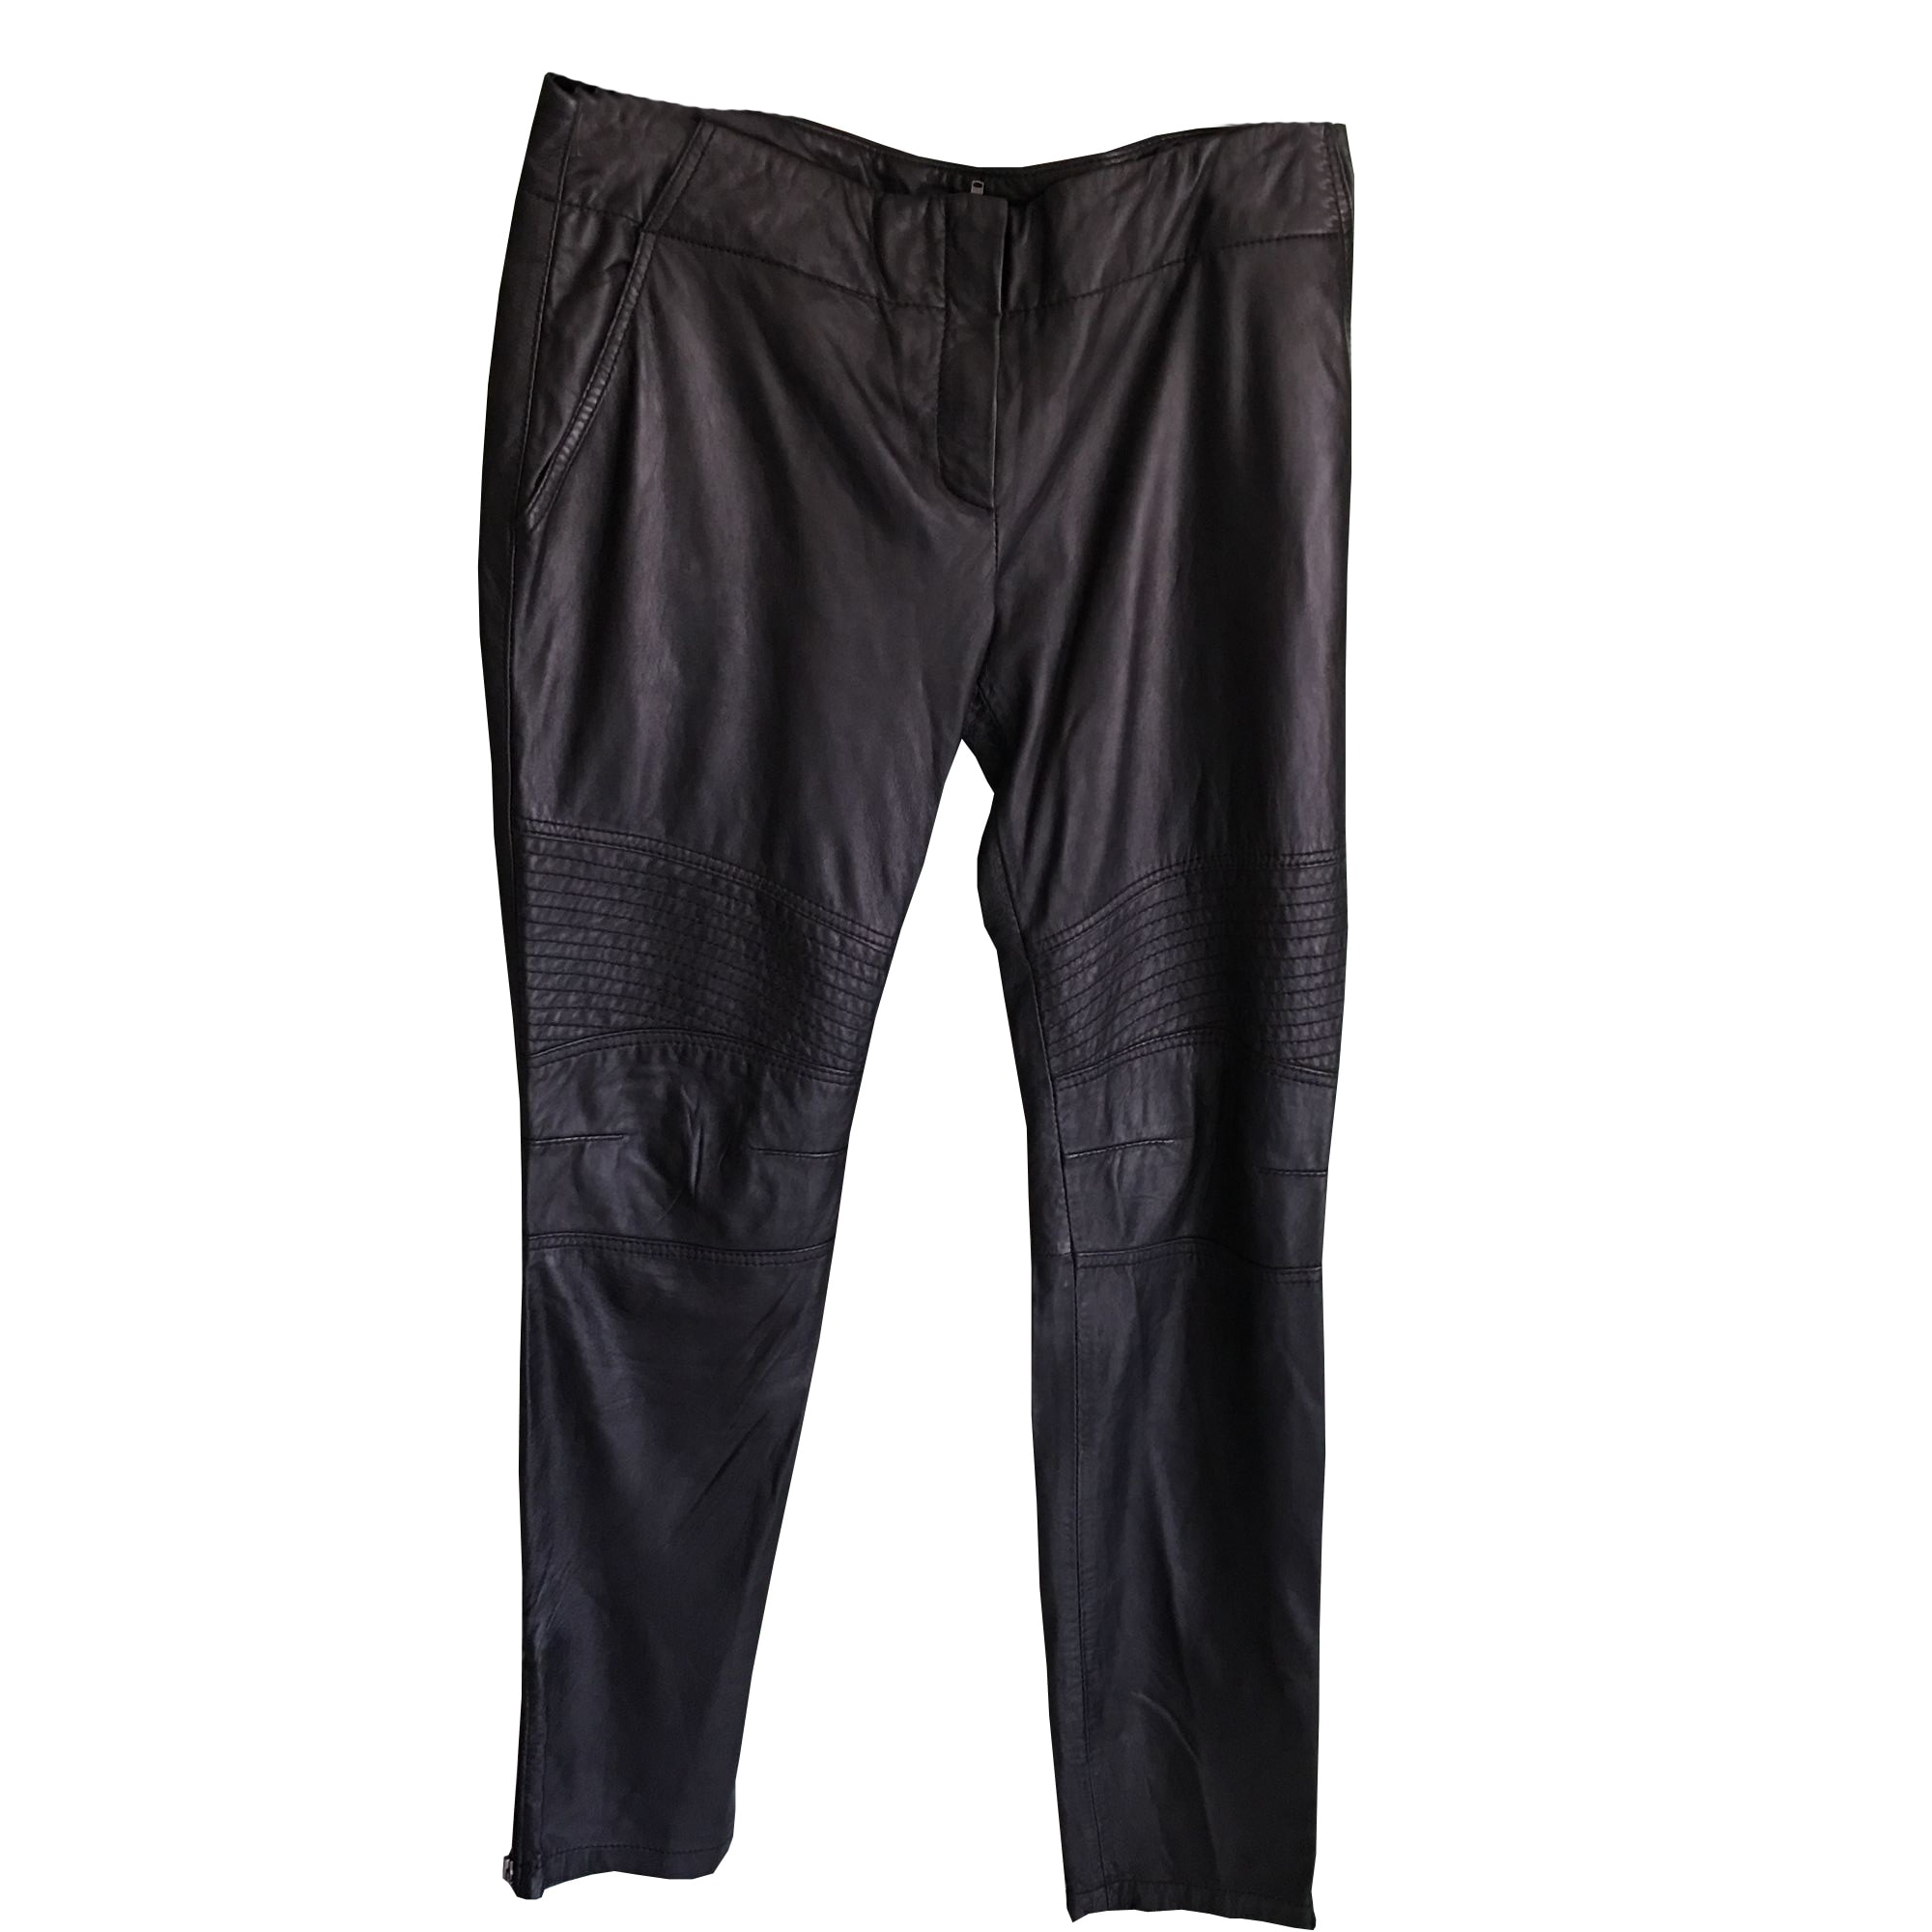 Pantalon slim, cigarette BEL AIR Noir